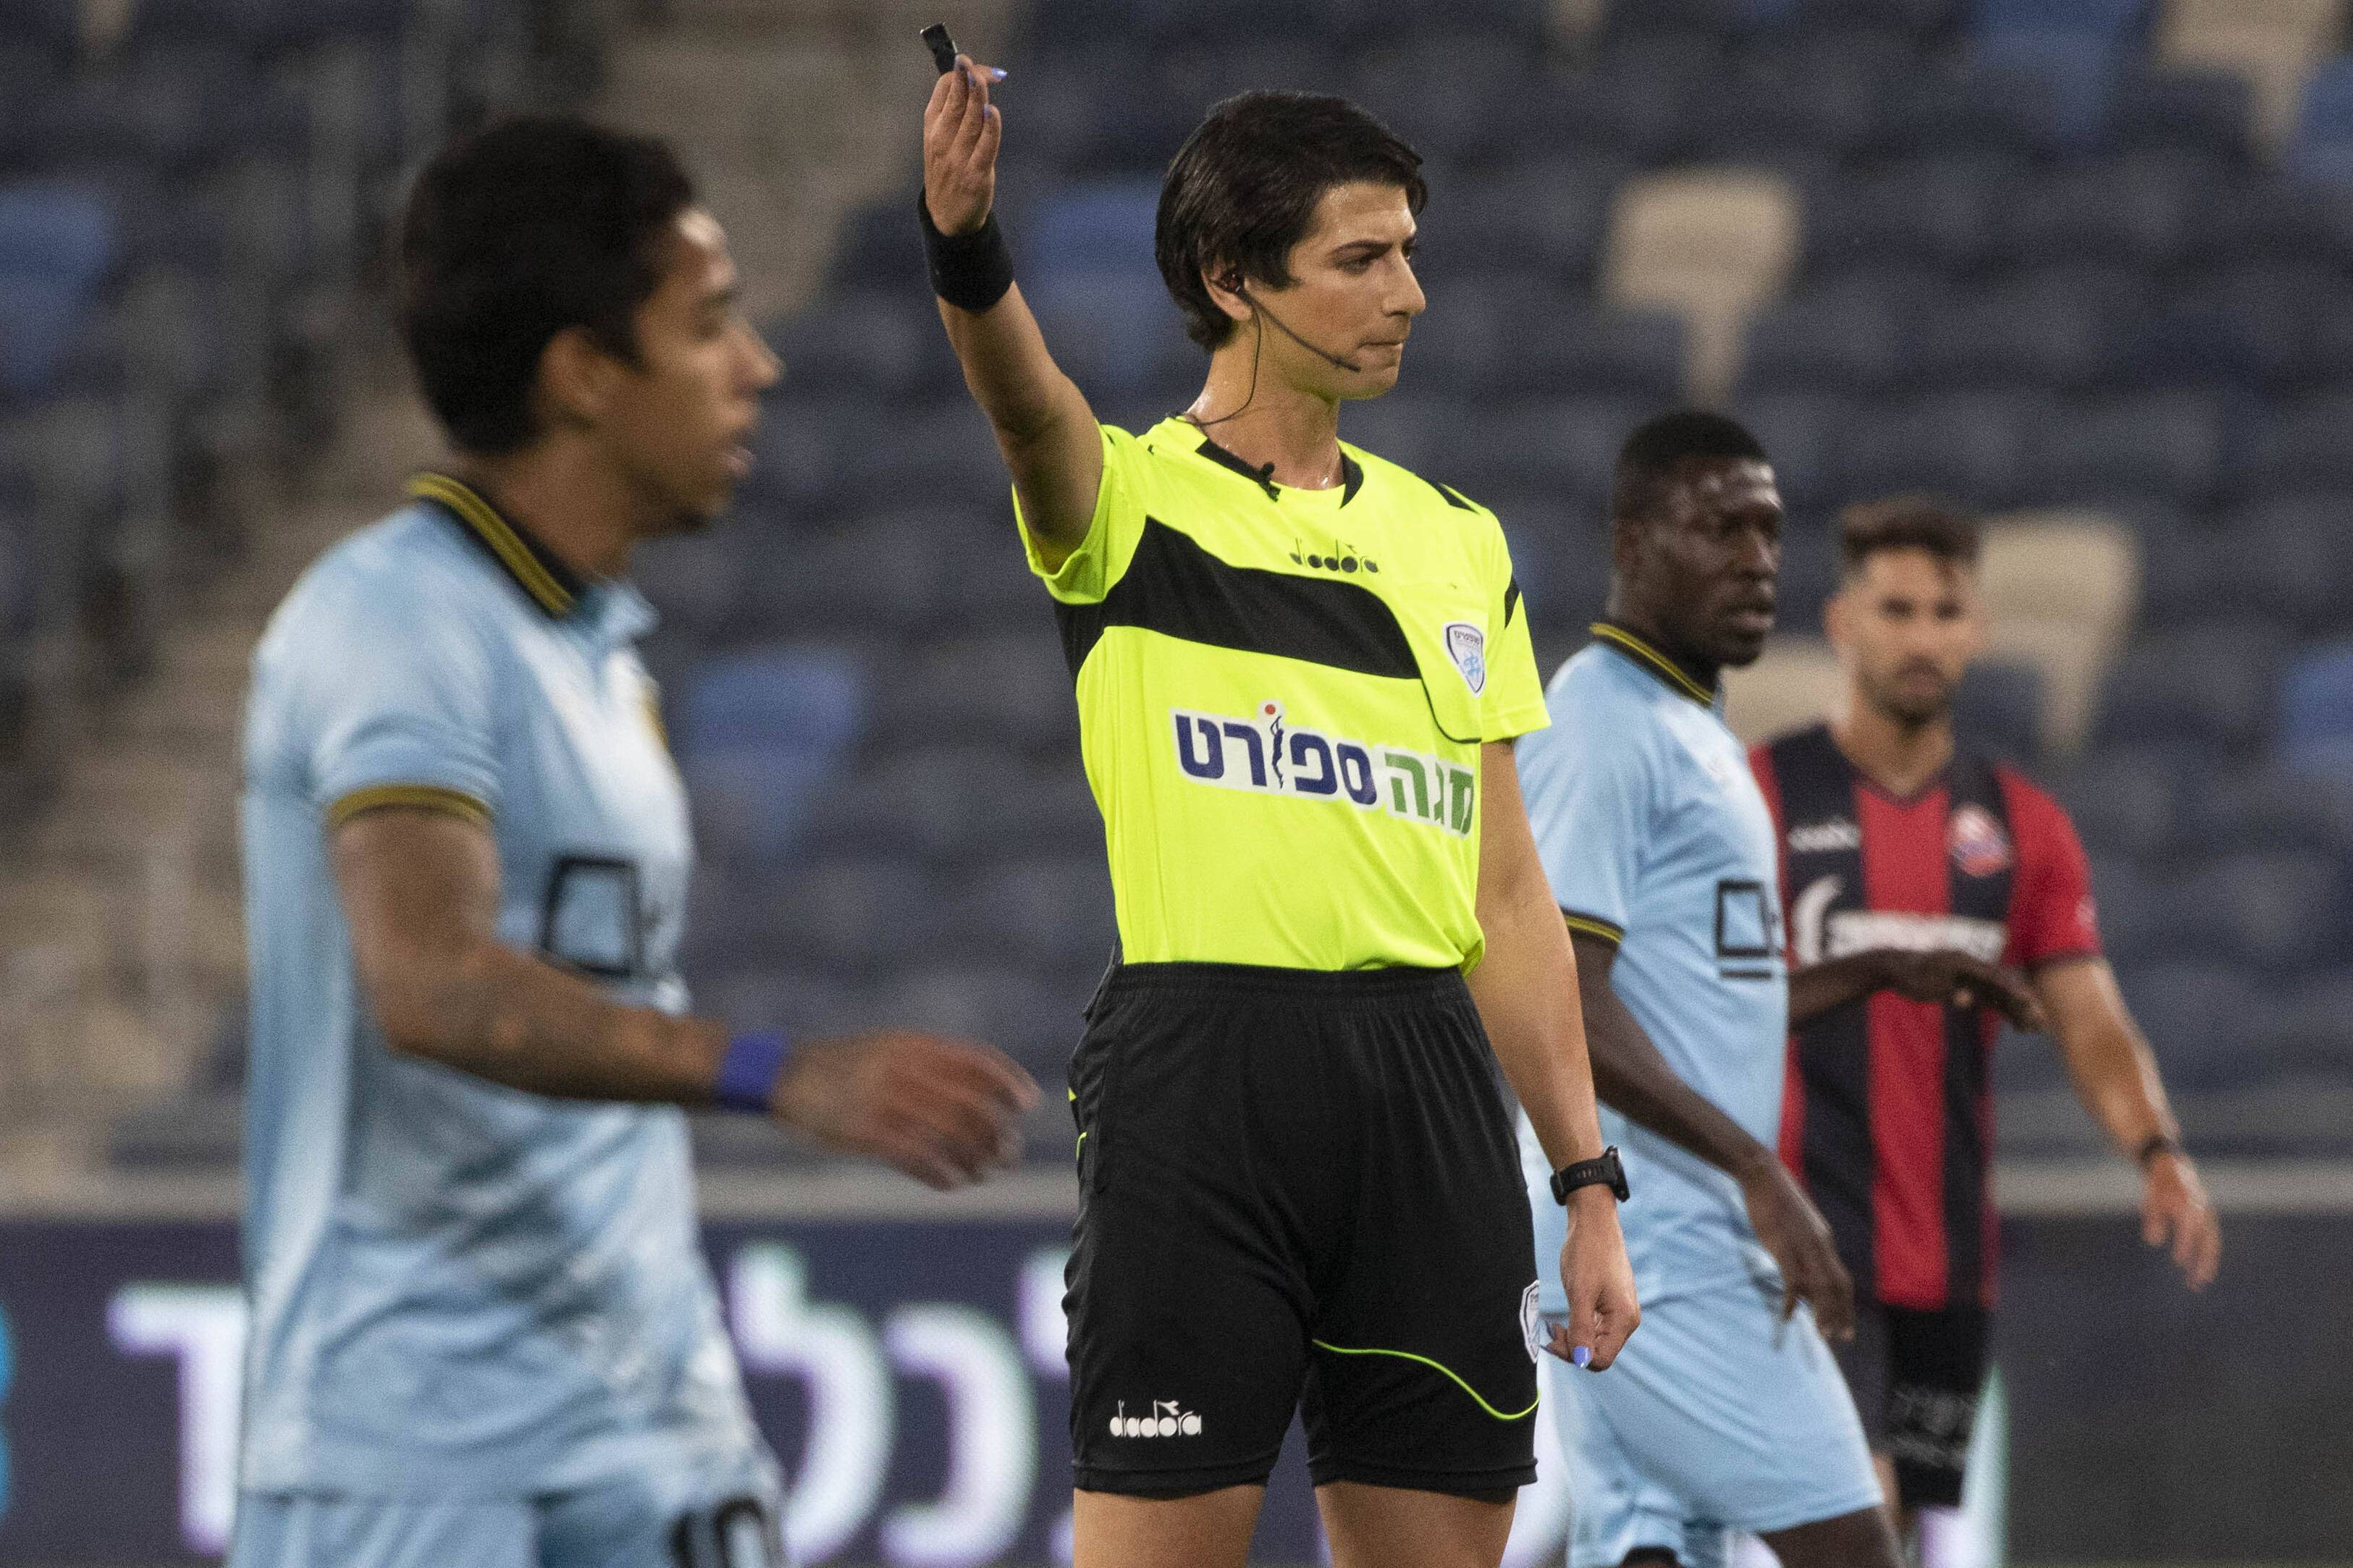 648x415 l arbitre sapir berman lors du match entre hapoel haifa et beitar jerusalem le 3 mai 2021